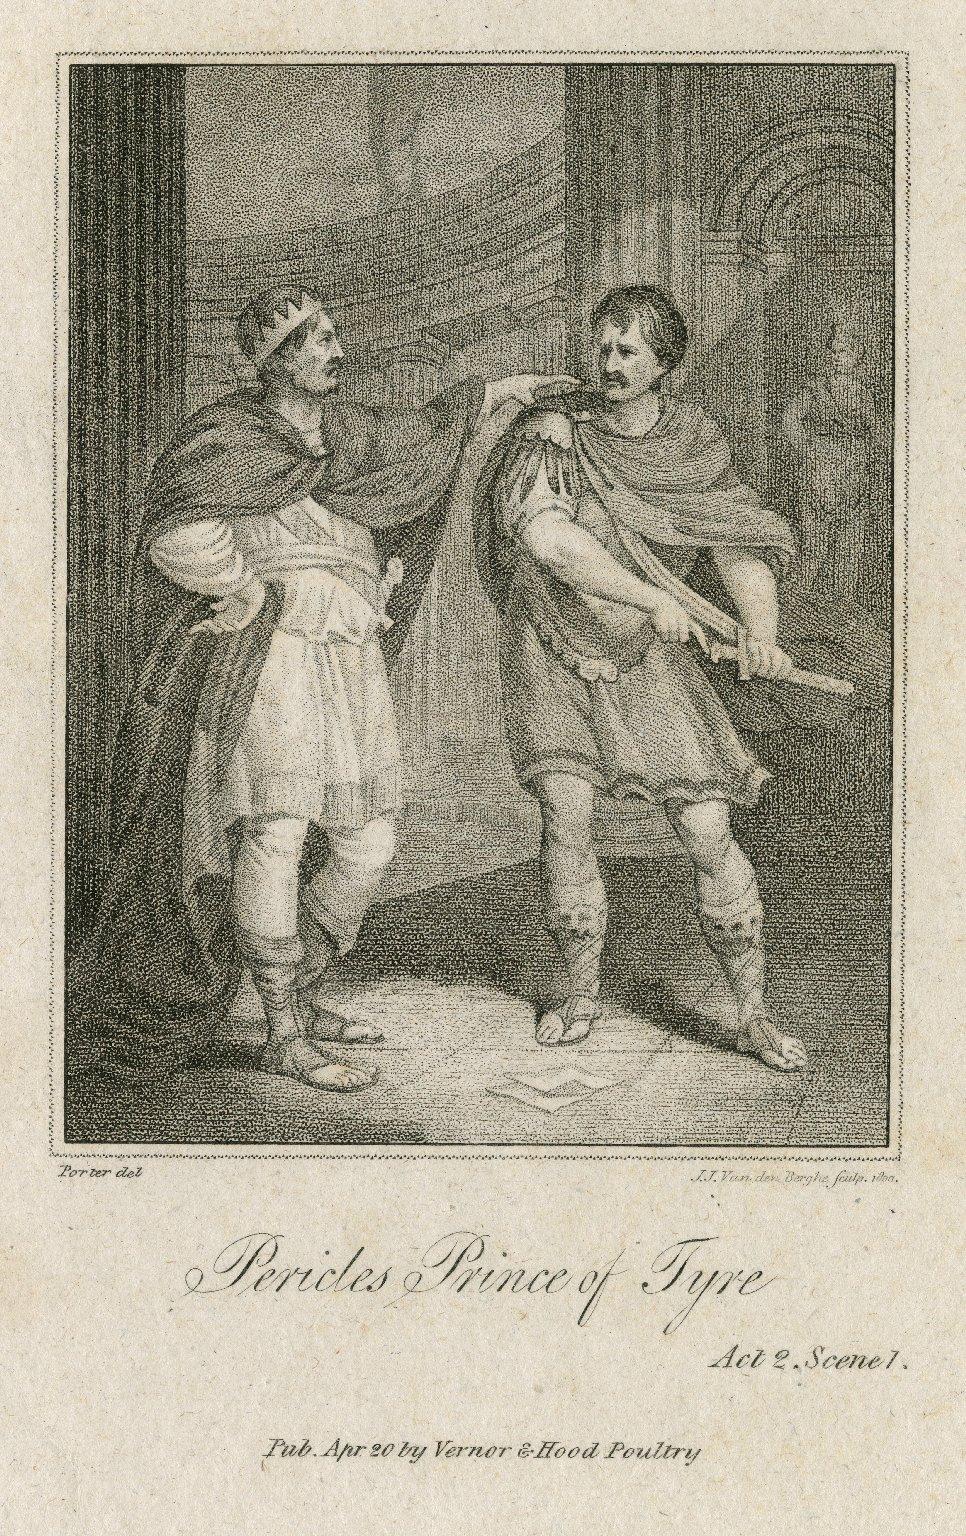 Pericles Prince of Tyre, act 2 [i.e. I], scene 1 [graphic] / Porter, del. ; J.J. Van den Berghe, sculp. 1800.